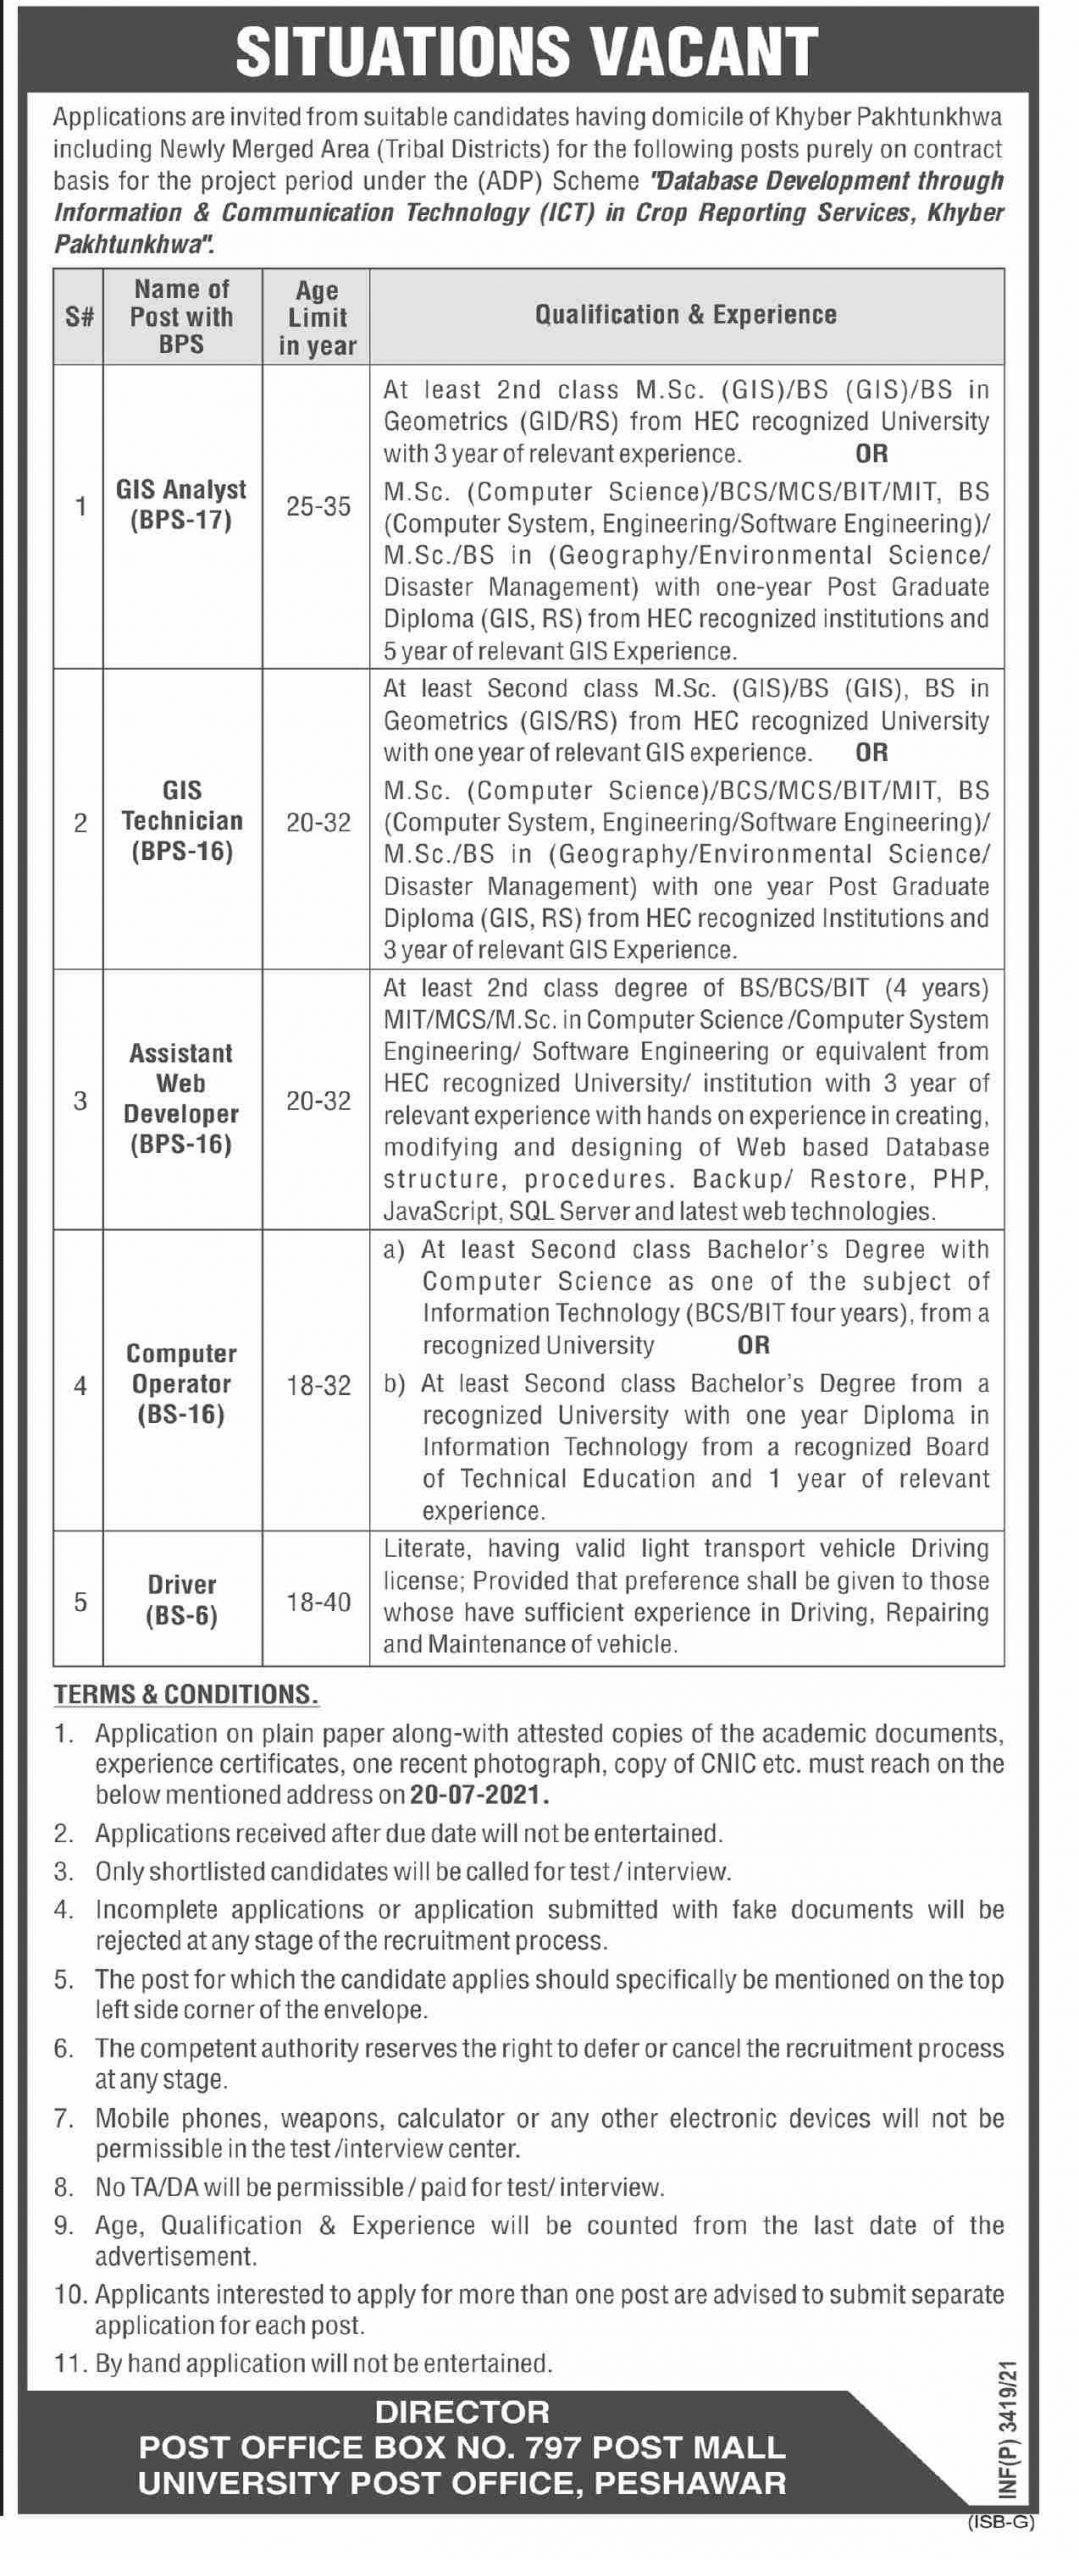 Today KPK Govt Jobs directorate of Crop Reporting Services 2021